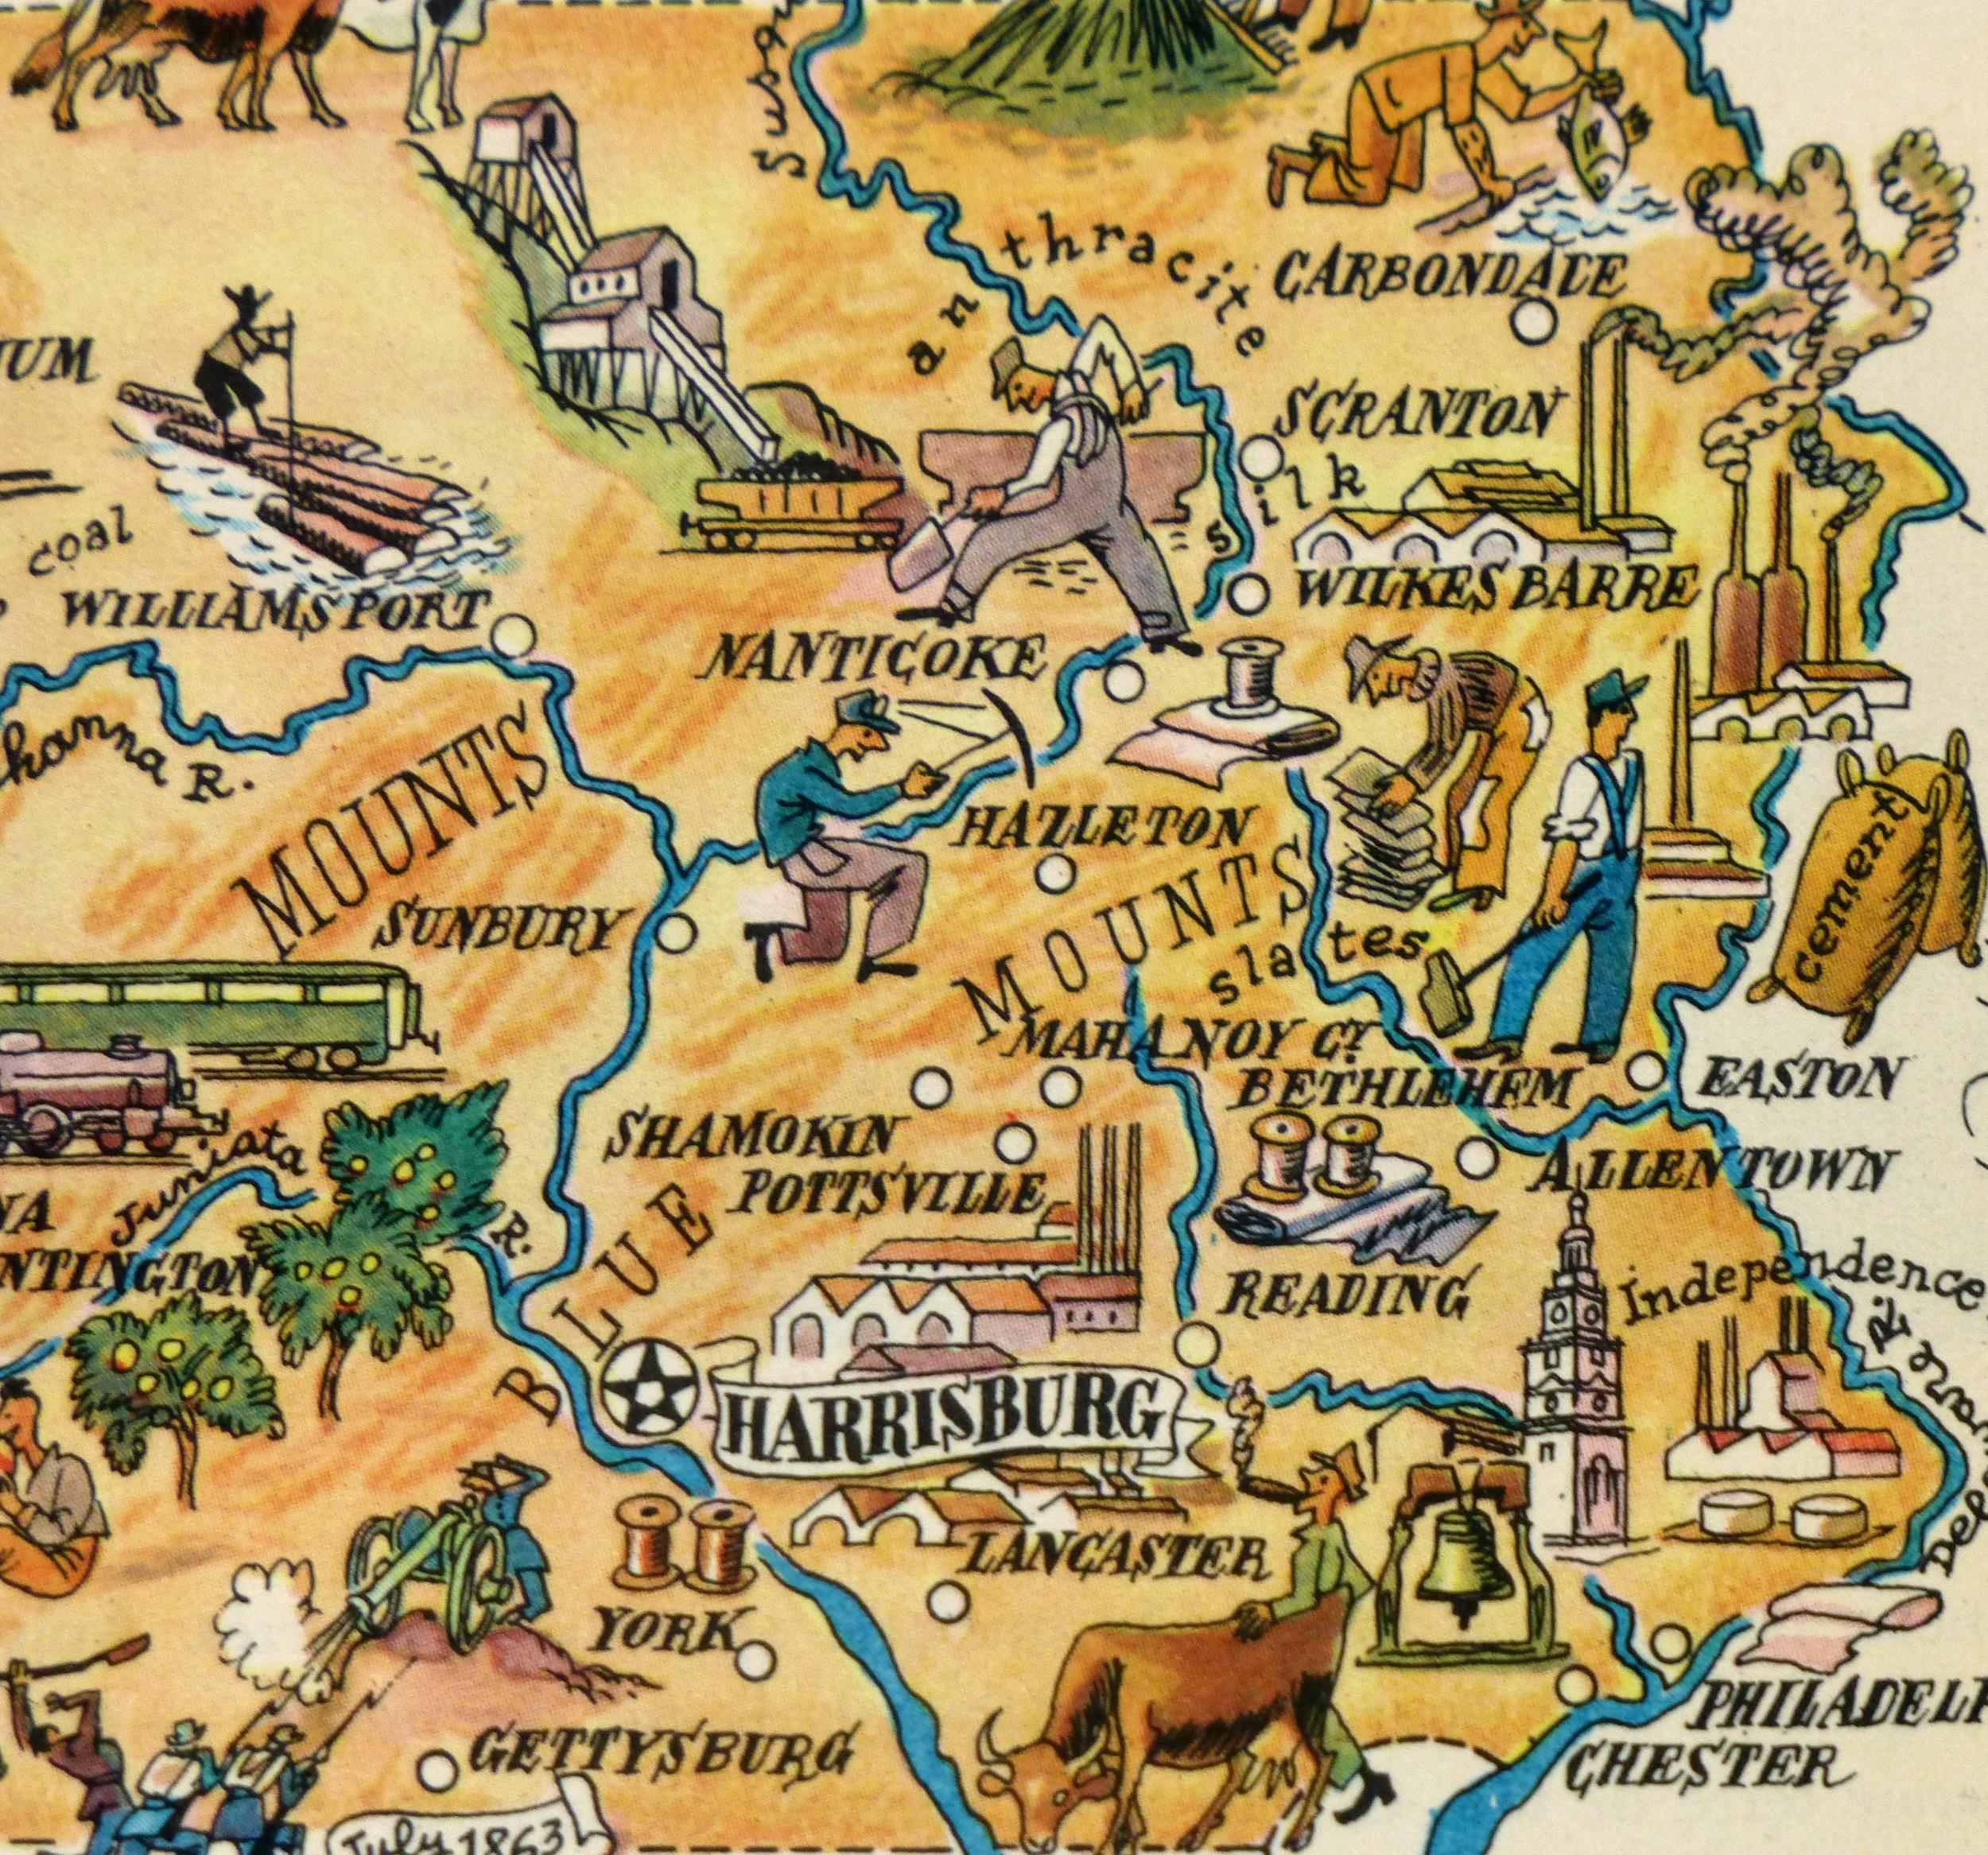 Pennsylvania Pictorial Map, 1946-detail-6275K